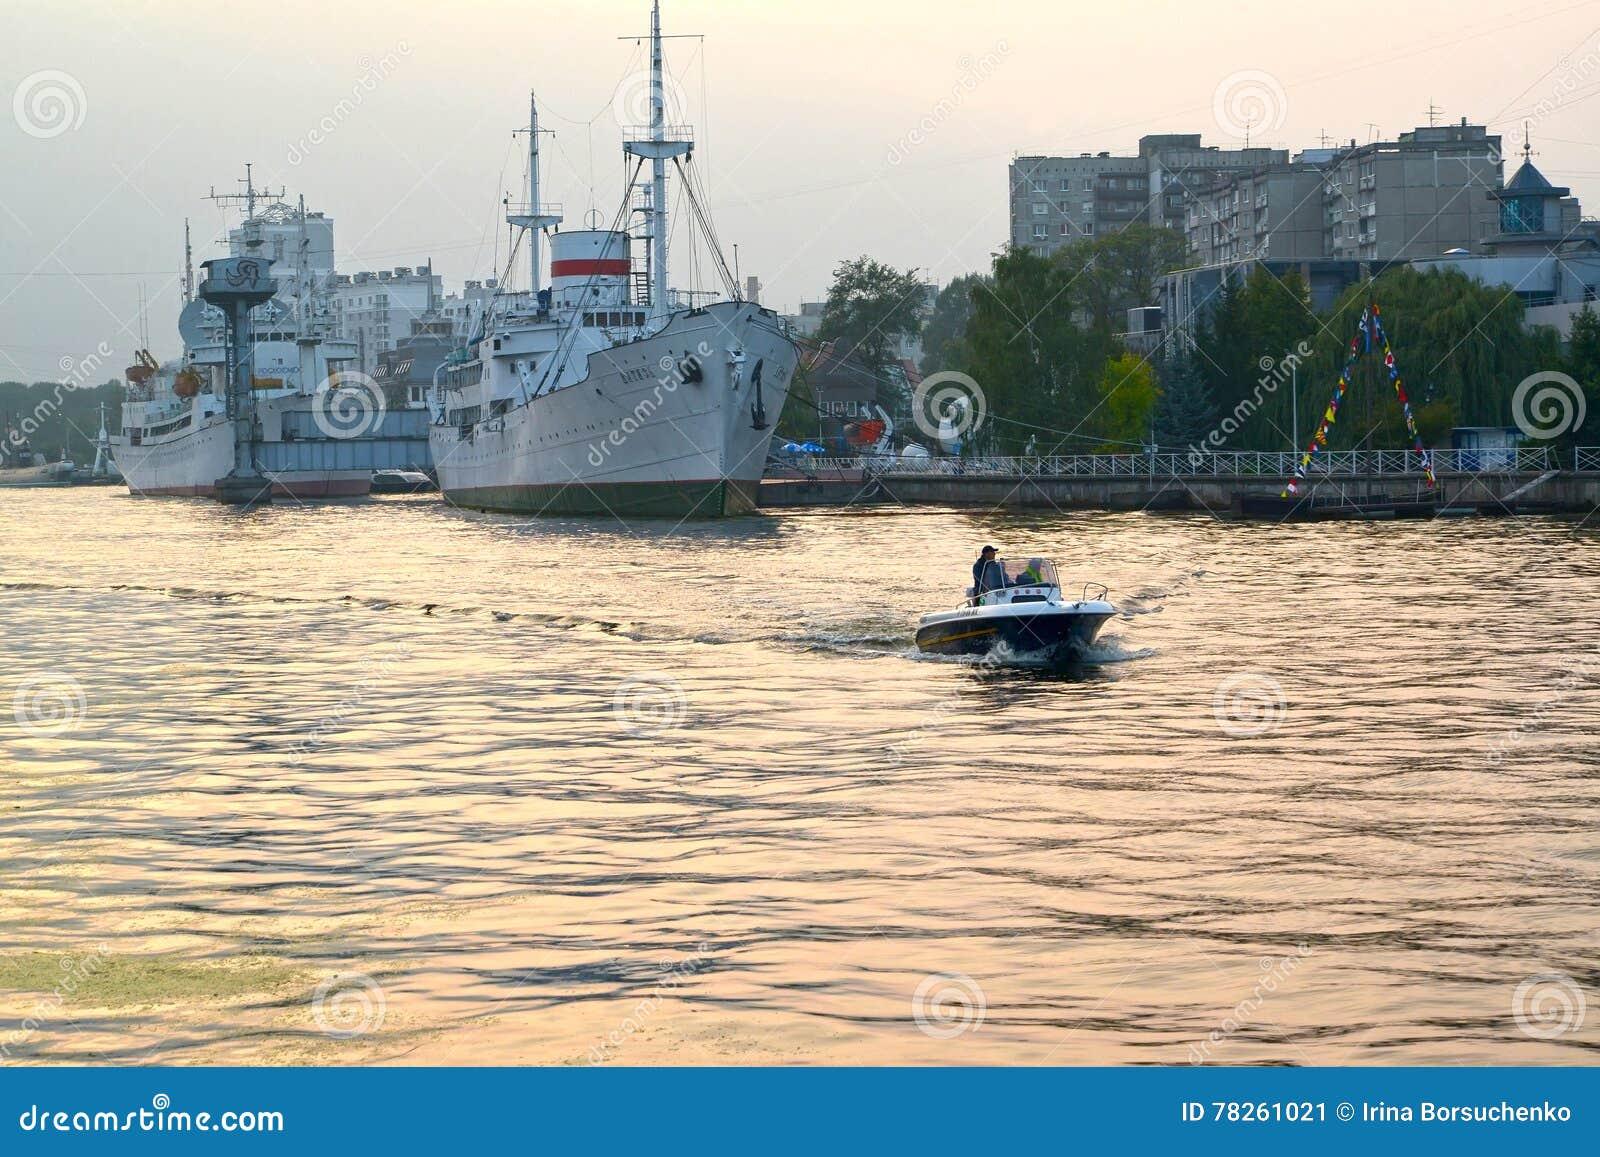 Kaliningrad, Ρωσία Μια άποψη σχετικά με τον ποταμό Pregolya και το ήρωα σκαφών το θερινό βράδυ